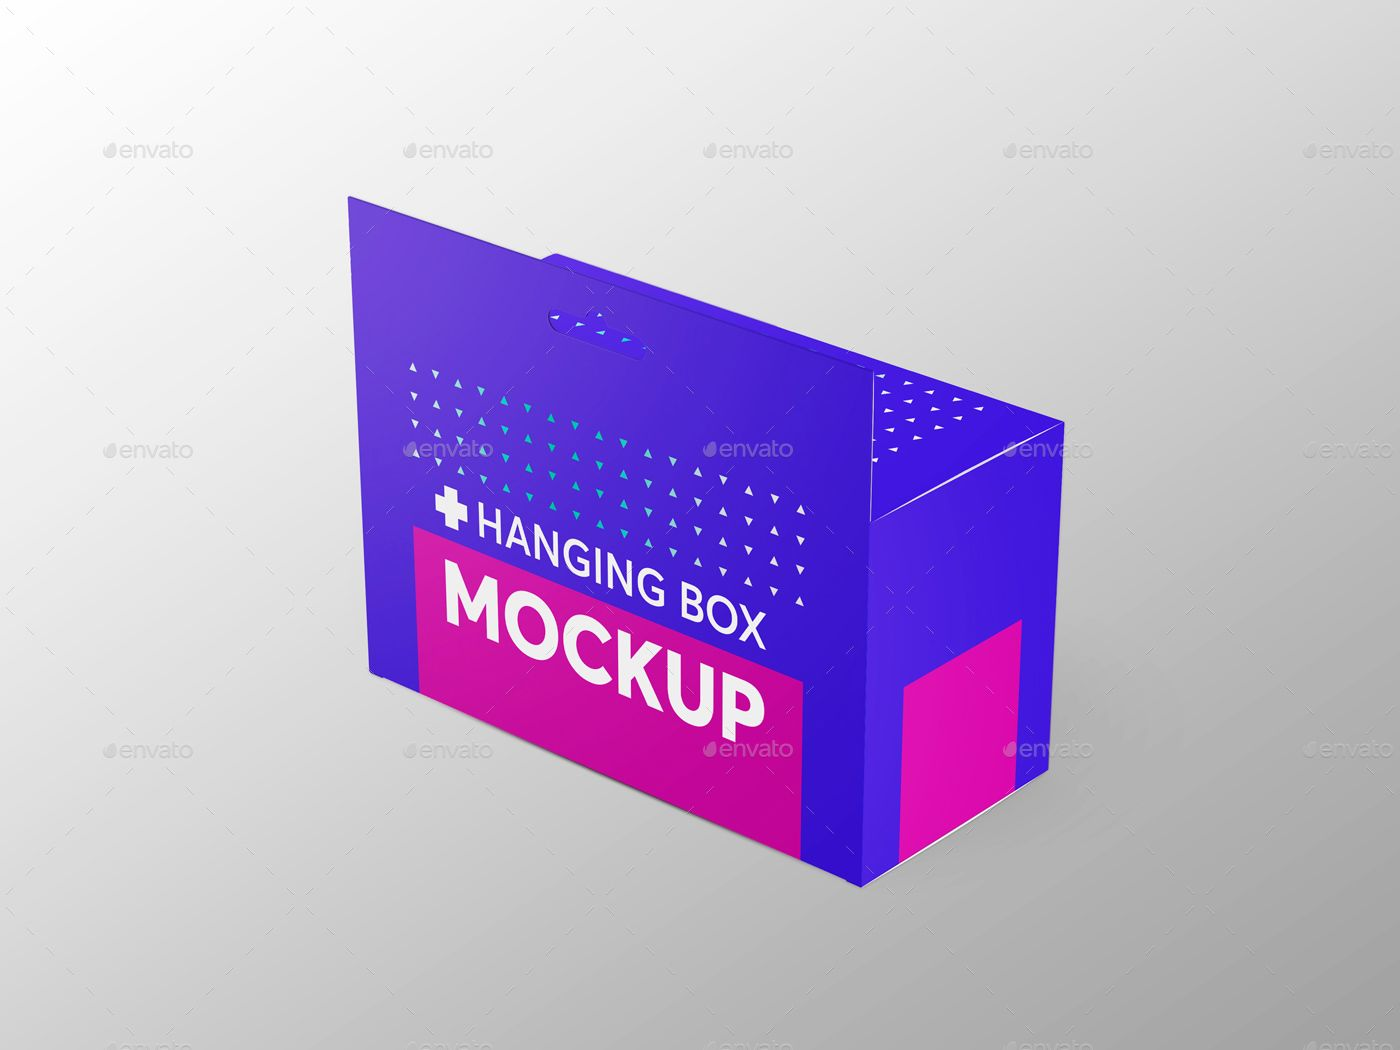 Download Hanging Rectangle Box Mockups V 2 Box Mockup Box Packaging Design Graphic Design Projects